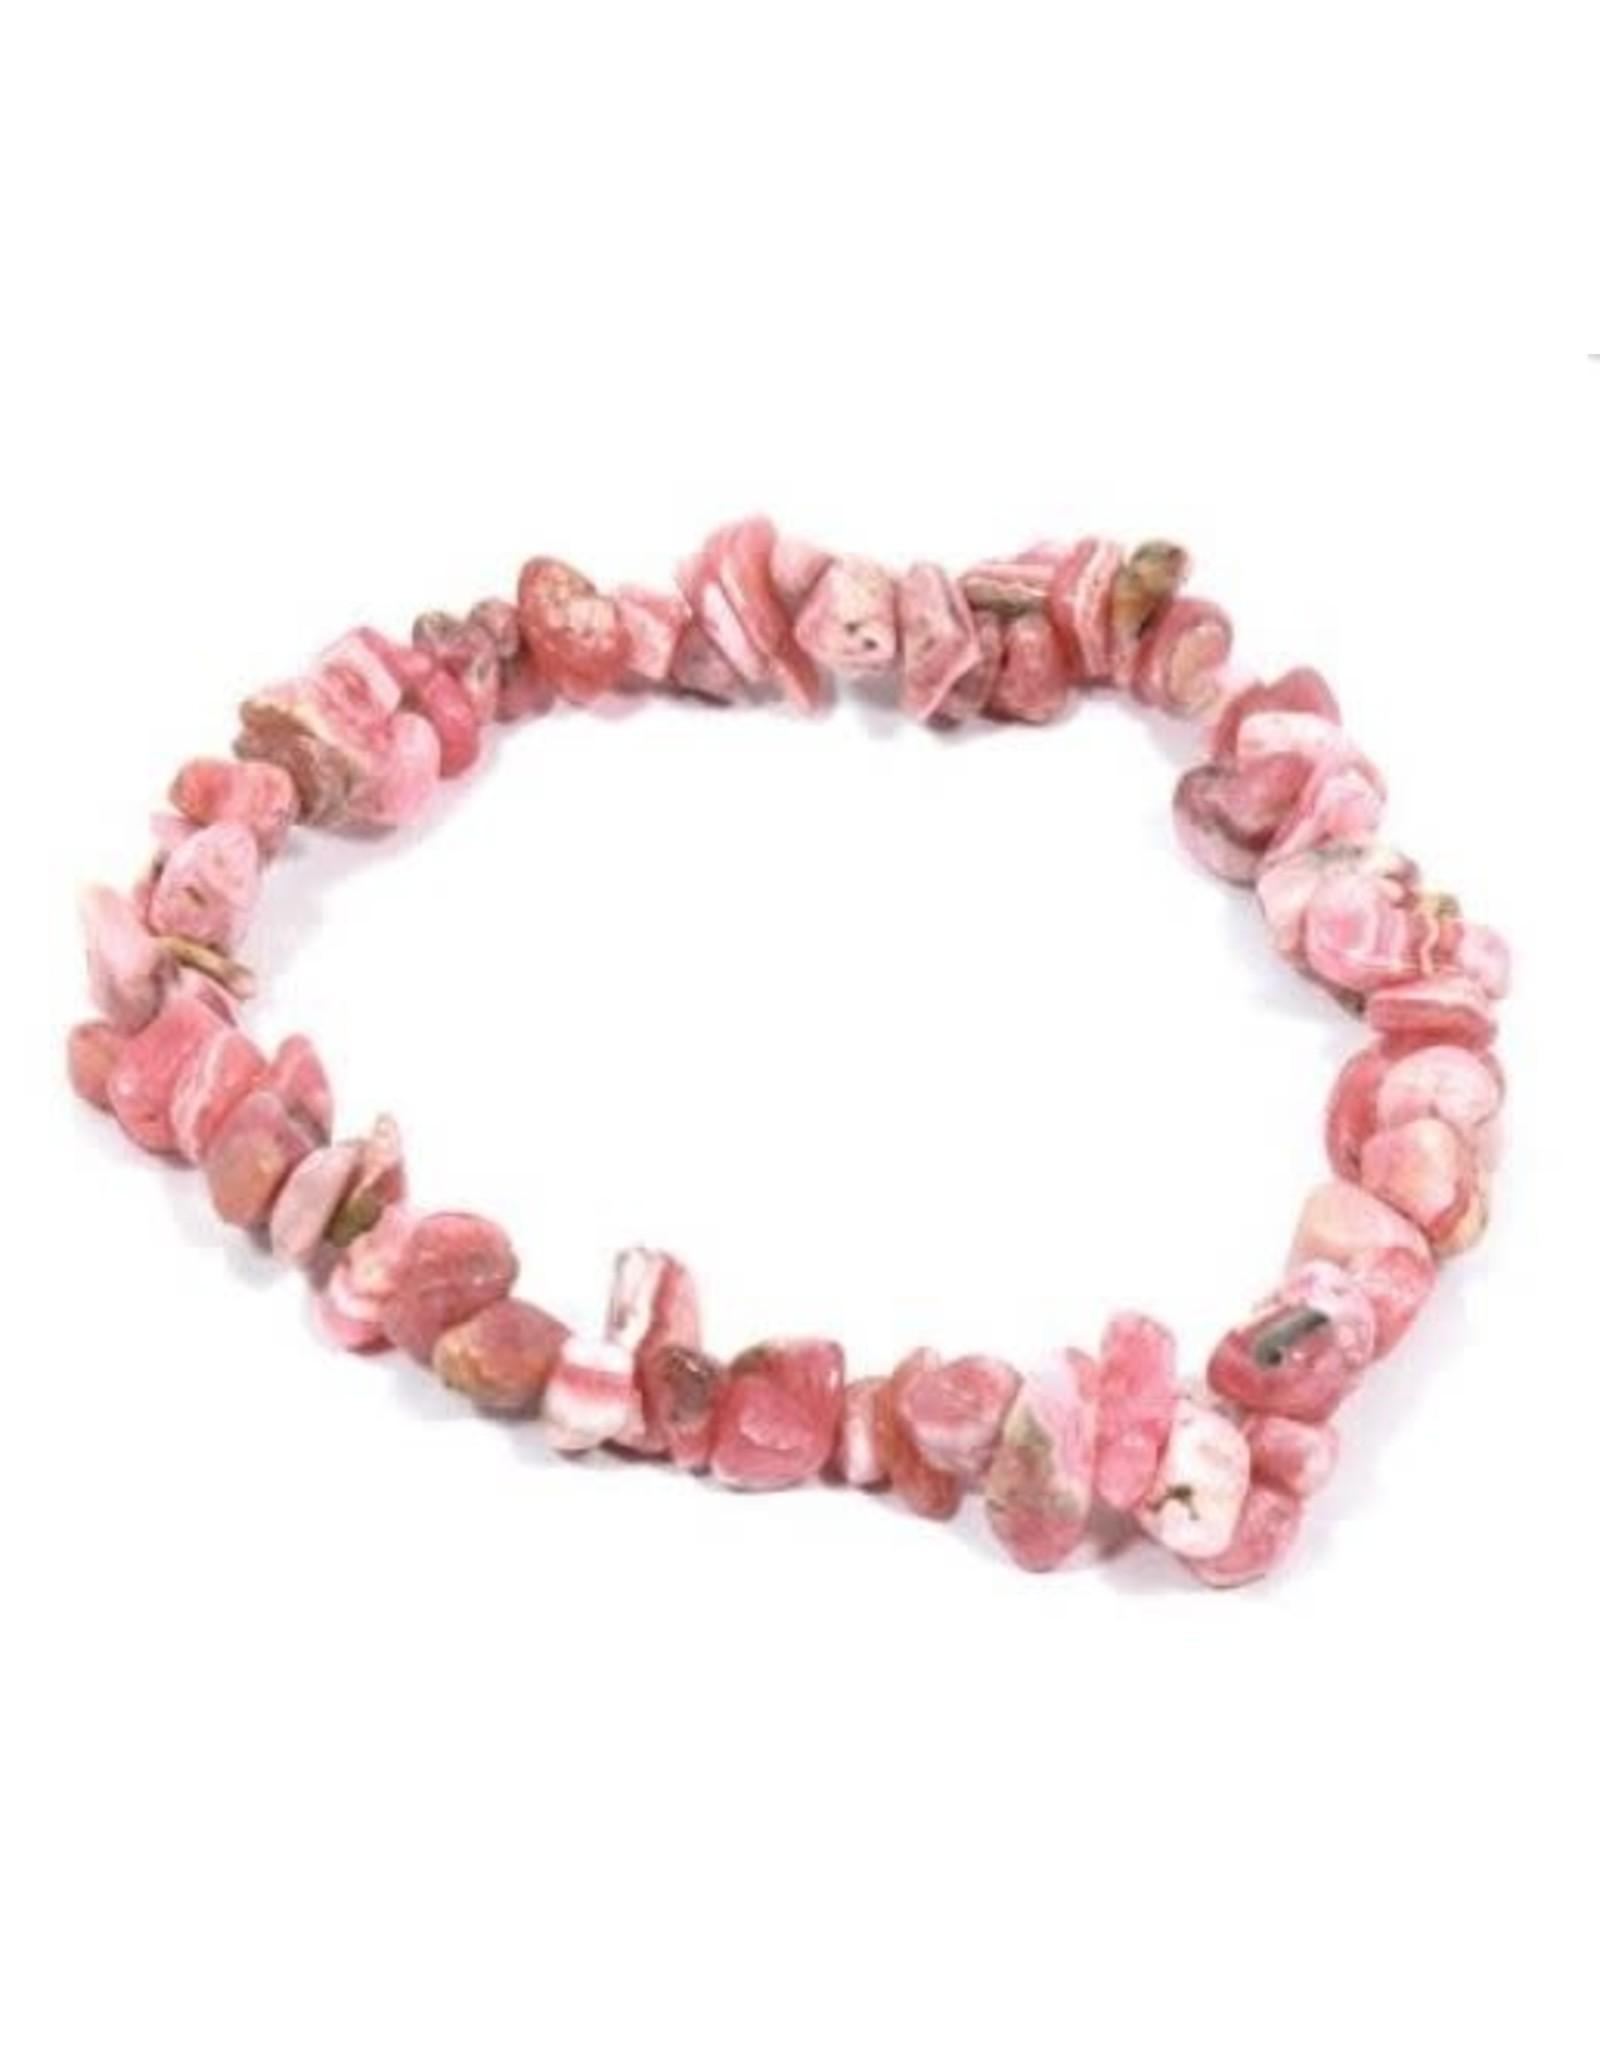 Silverstone Crystal Chip Bracelet - Rhodochrosite